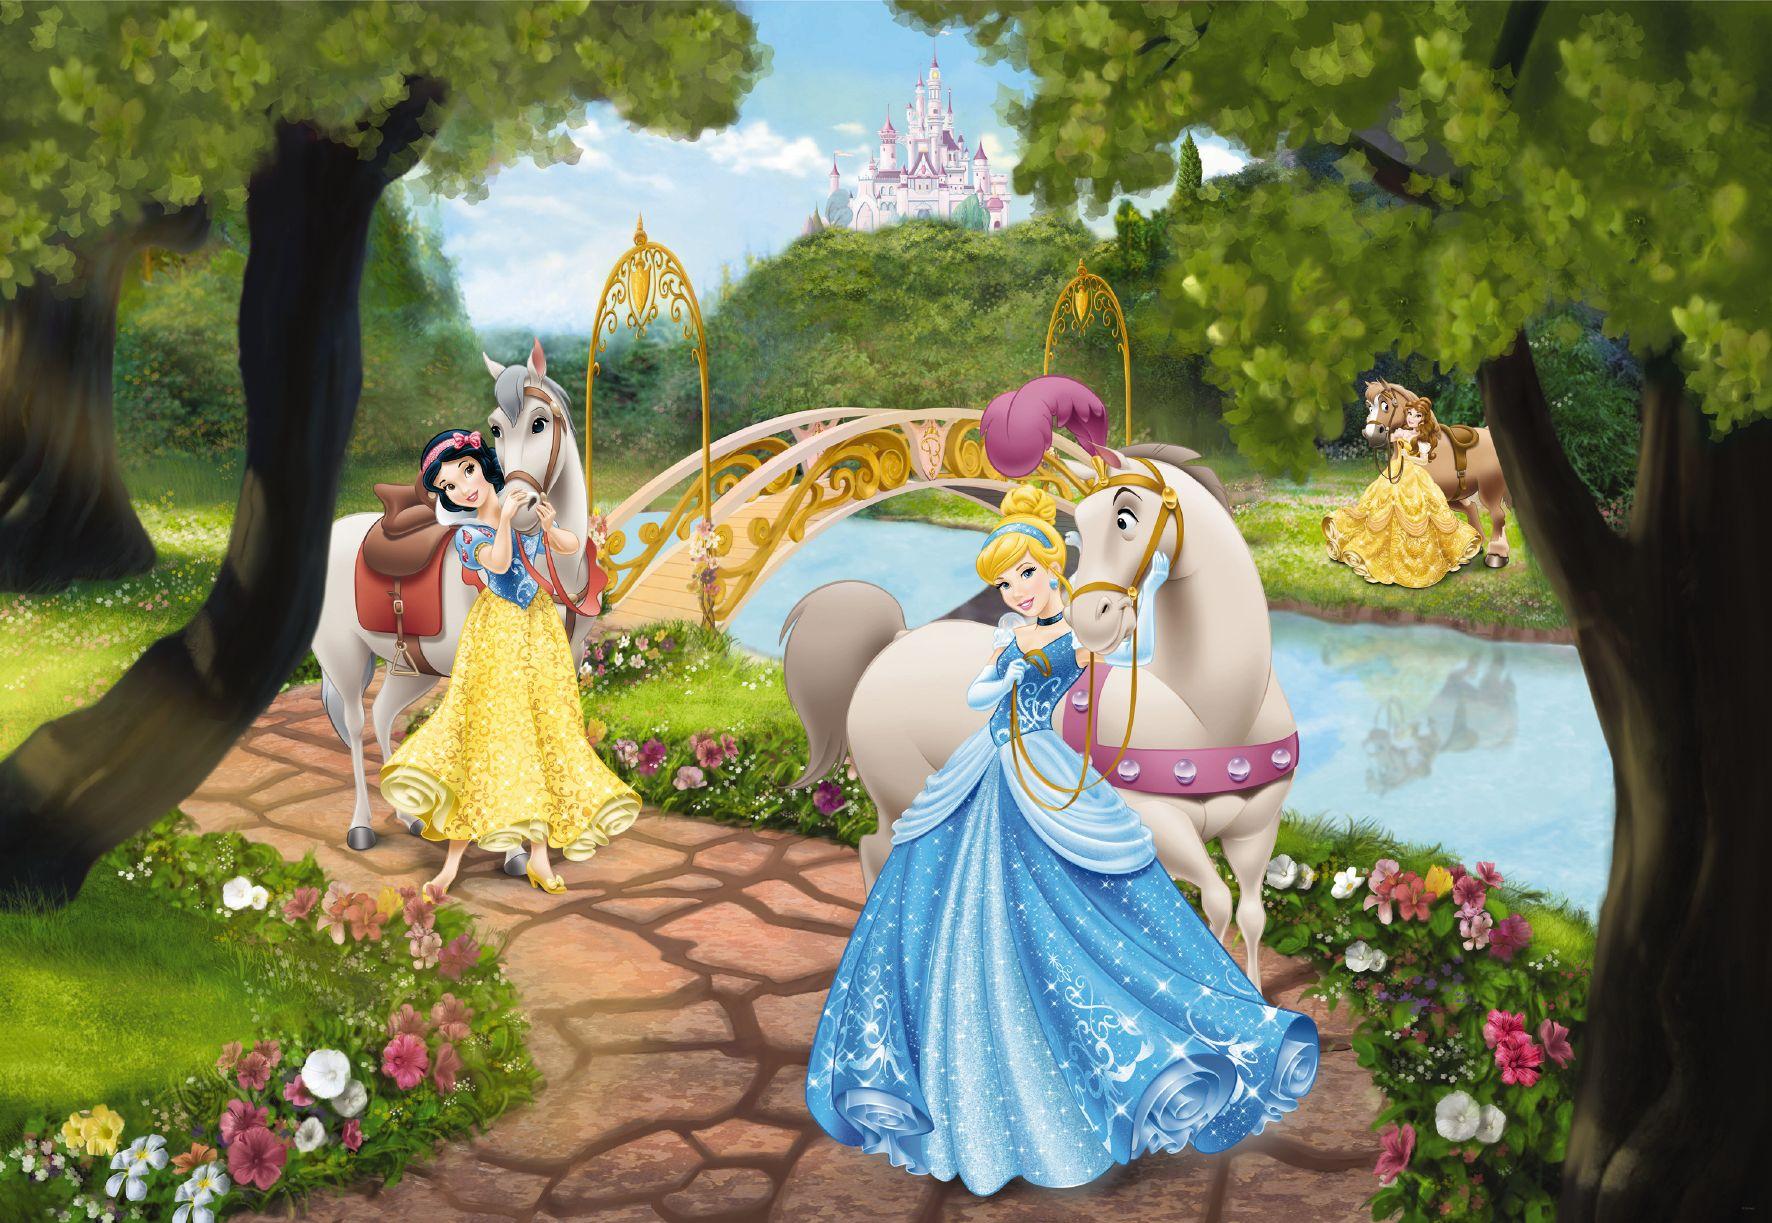 Hercegnők Disney poszter<br /><br />http://www.oriasposzter.hu/poszter-tapetak/78145-princess-royal-gala-hercegnok-disney-gyerekszoba-poszter-tapeta.html